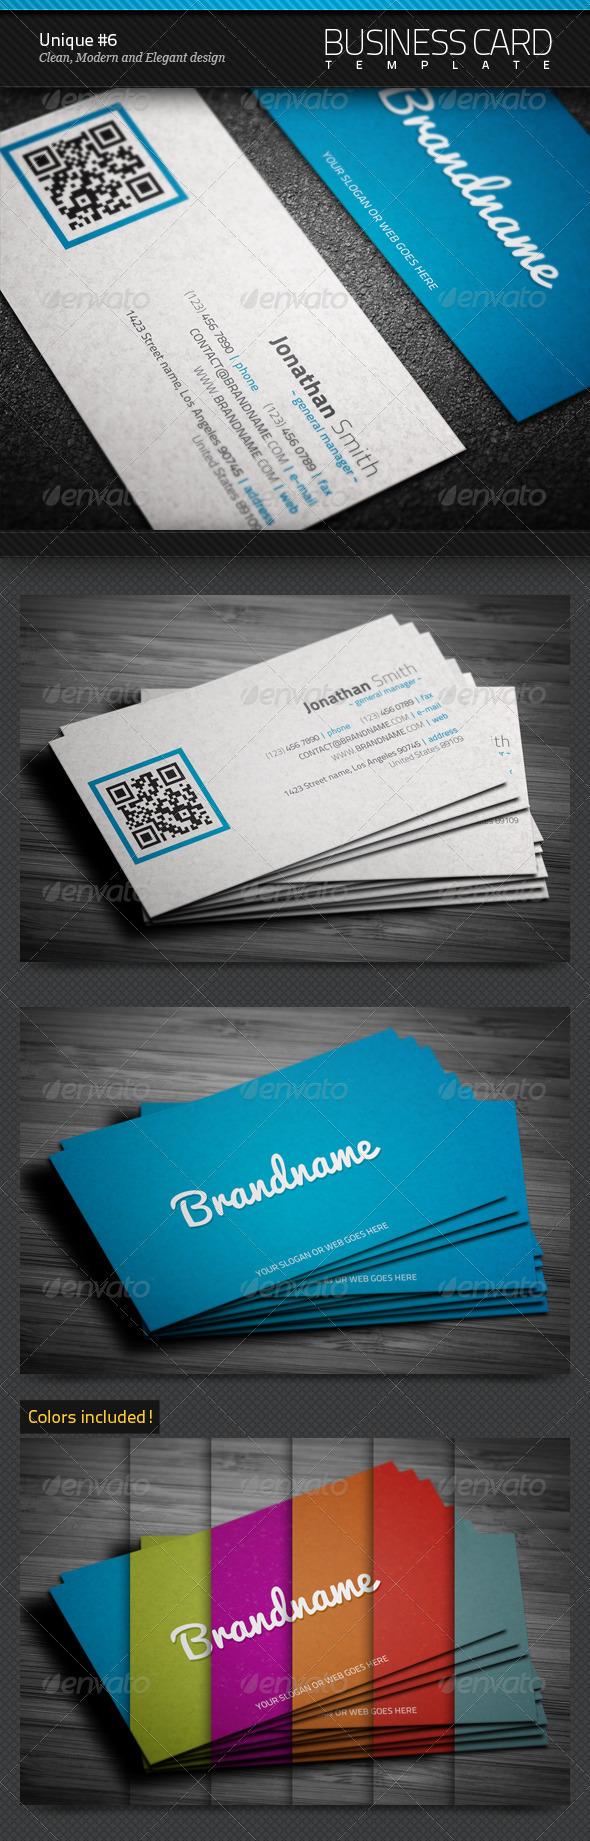 Unique Business Card #6 - Corporate Business Cards